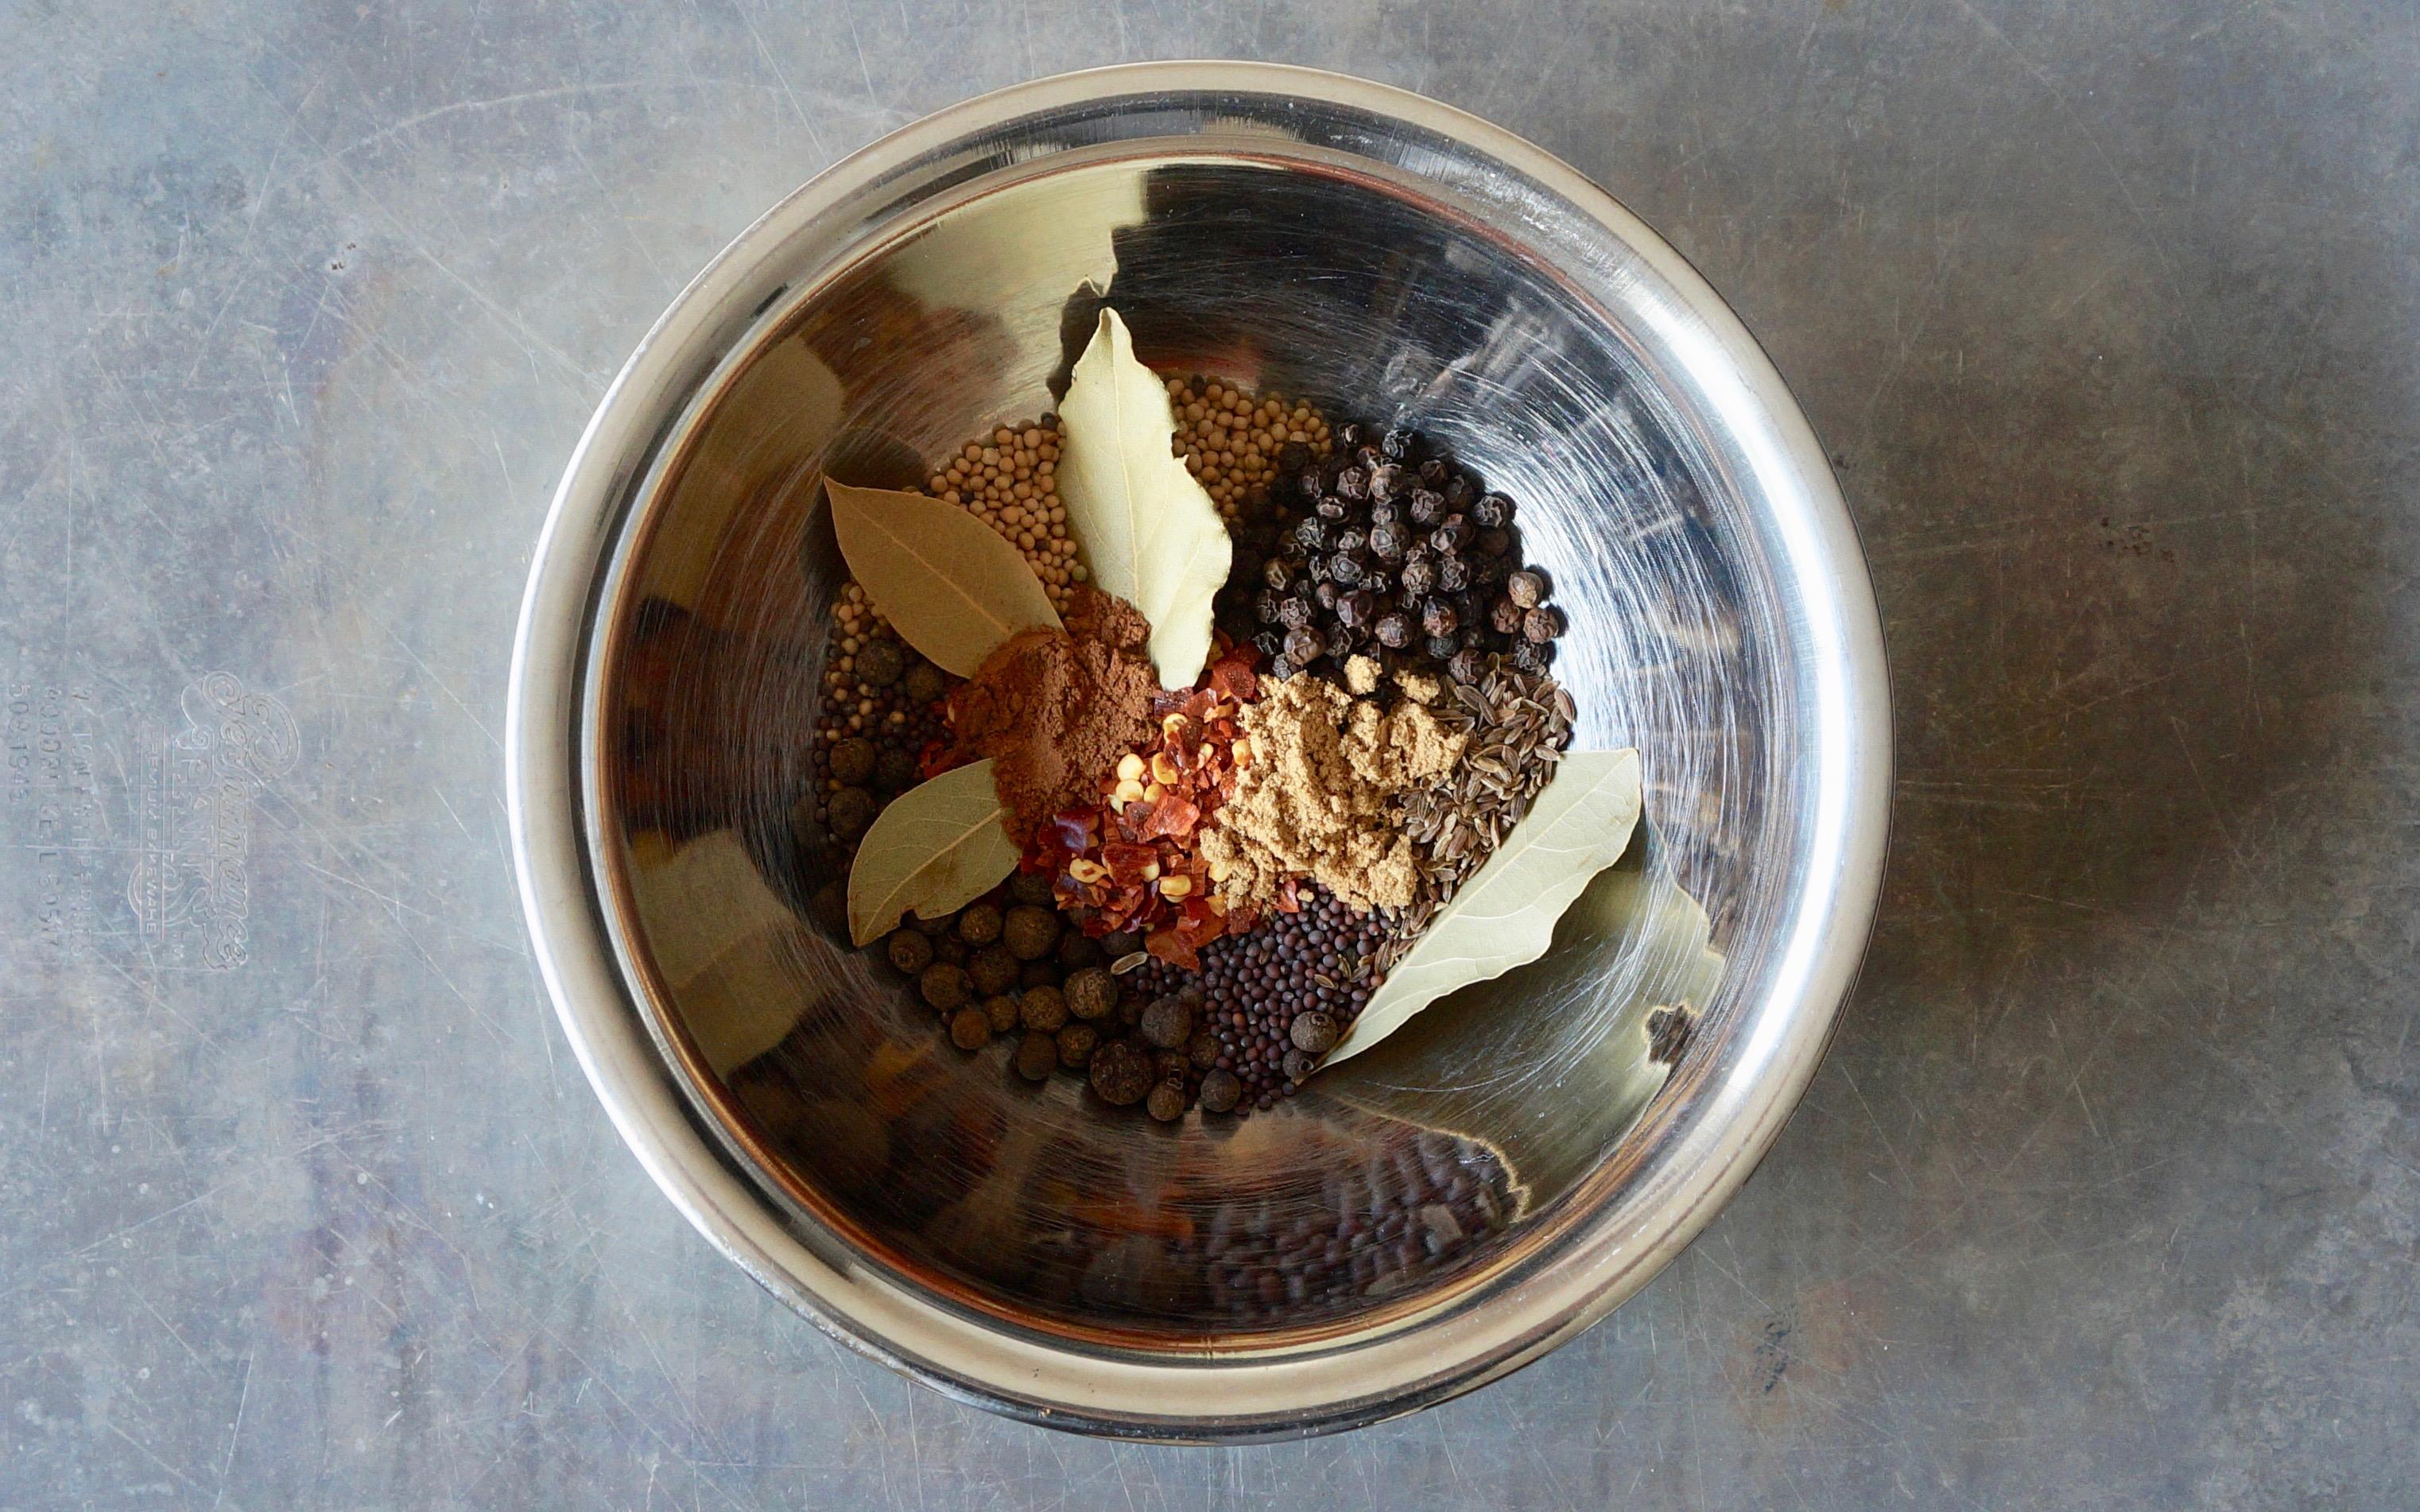 Corned-Beef-Pickling-Spice-Blend-Rebecca-Gordon-Publisher-Buttermilk-Lipstick-Culinary-Entertaining-Techniques-Southern-Hostess-RebeccaGordon-Pastry-Chef-Birmingham-Alabama